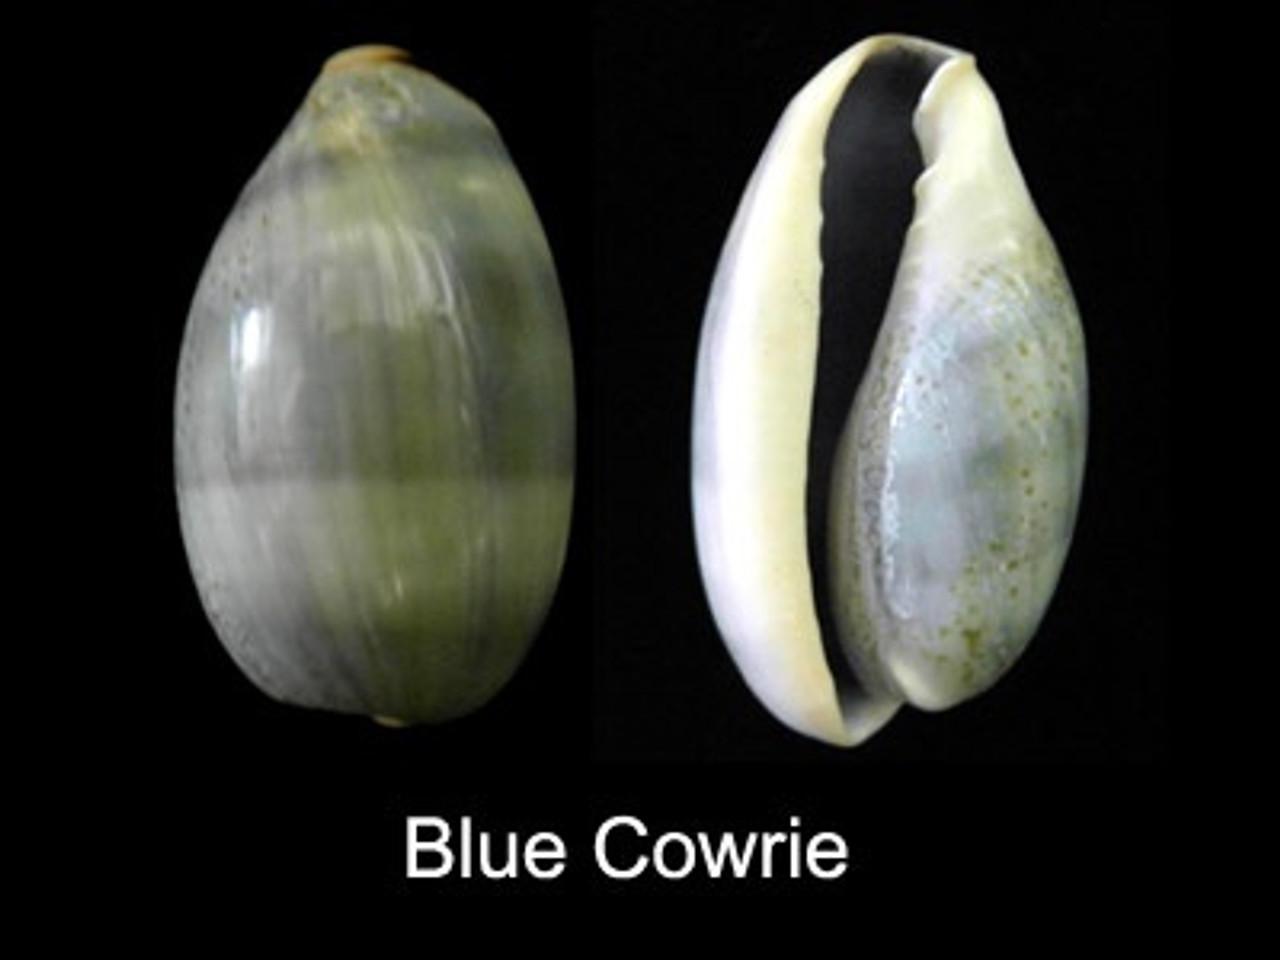 Cypraea Errones set of 5 shells